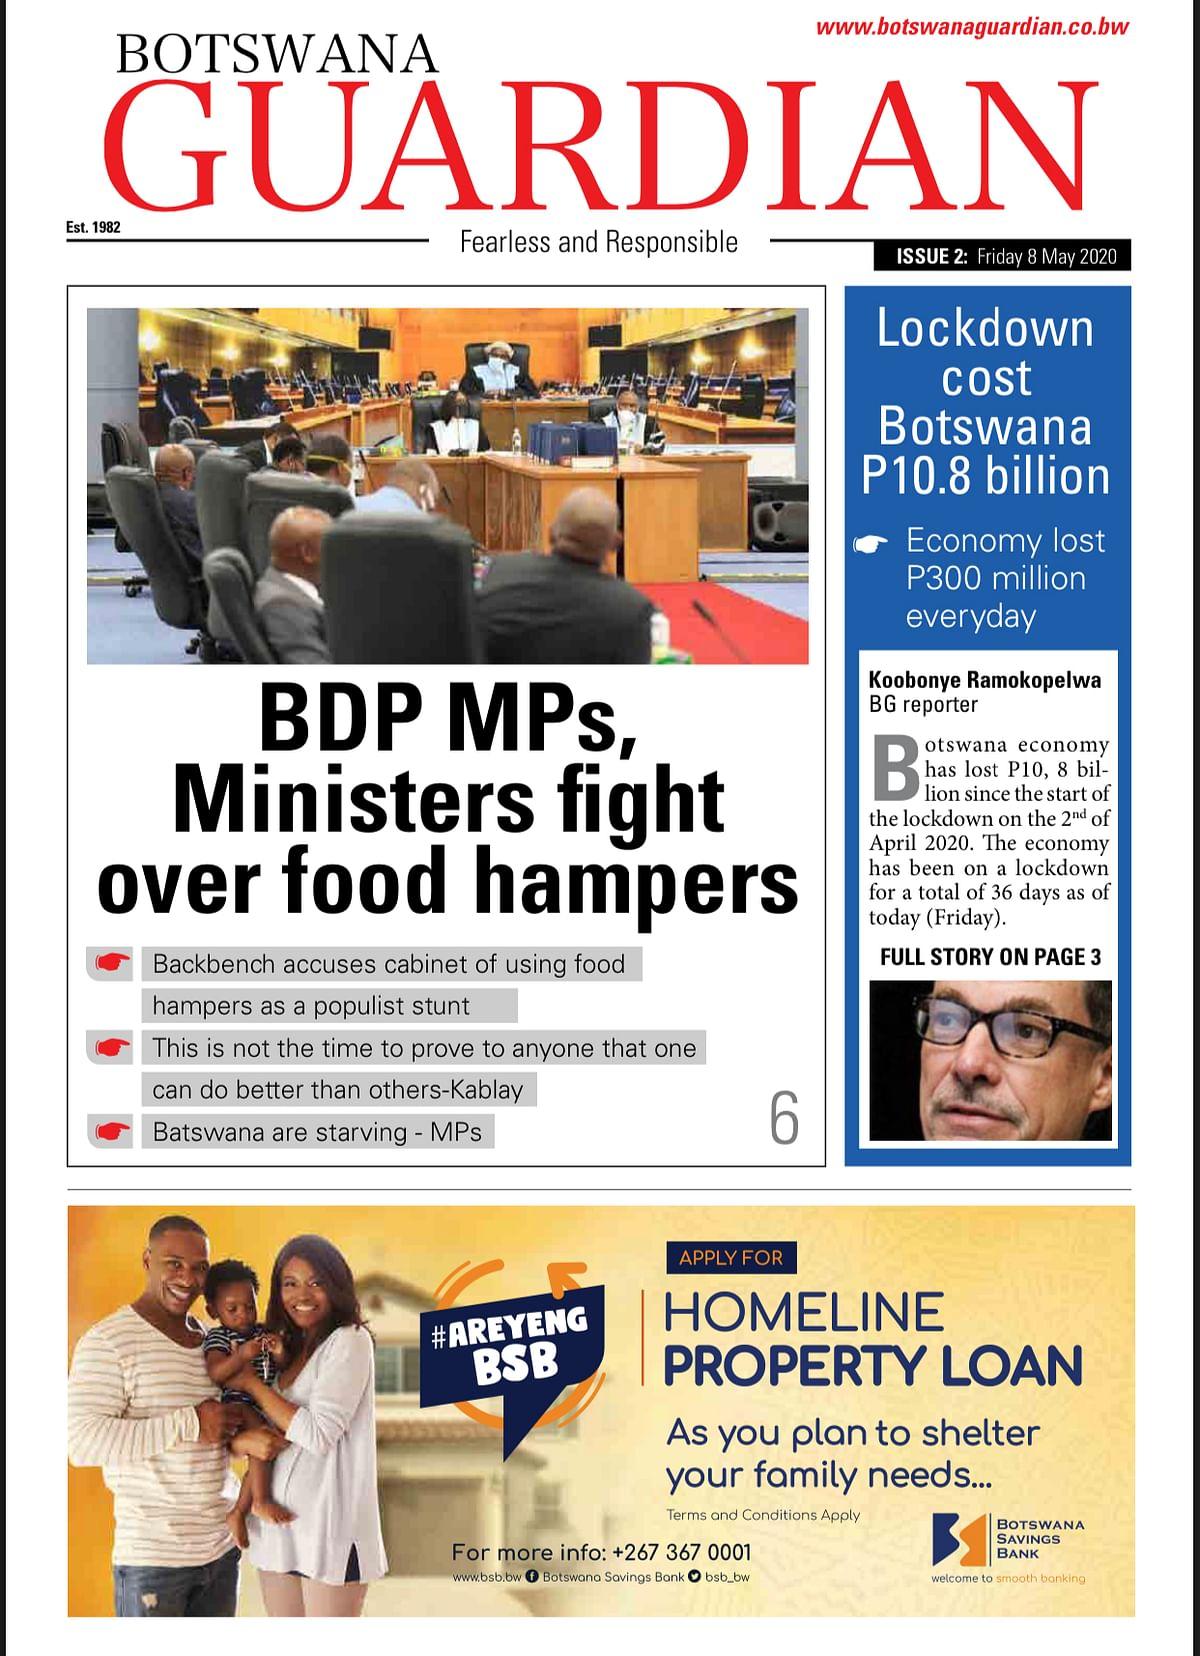 Botswana Guardian 8.5.2020